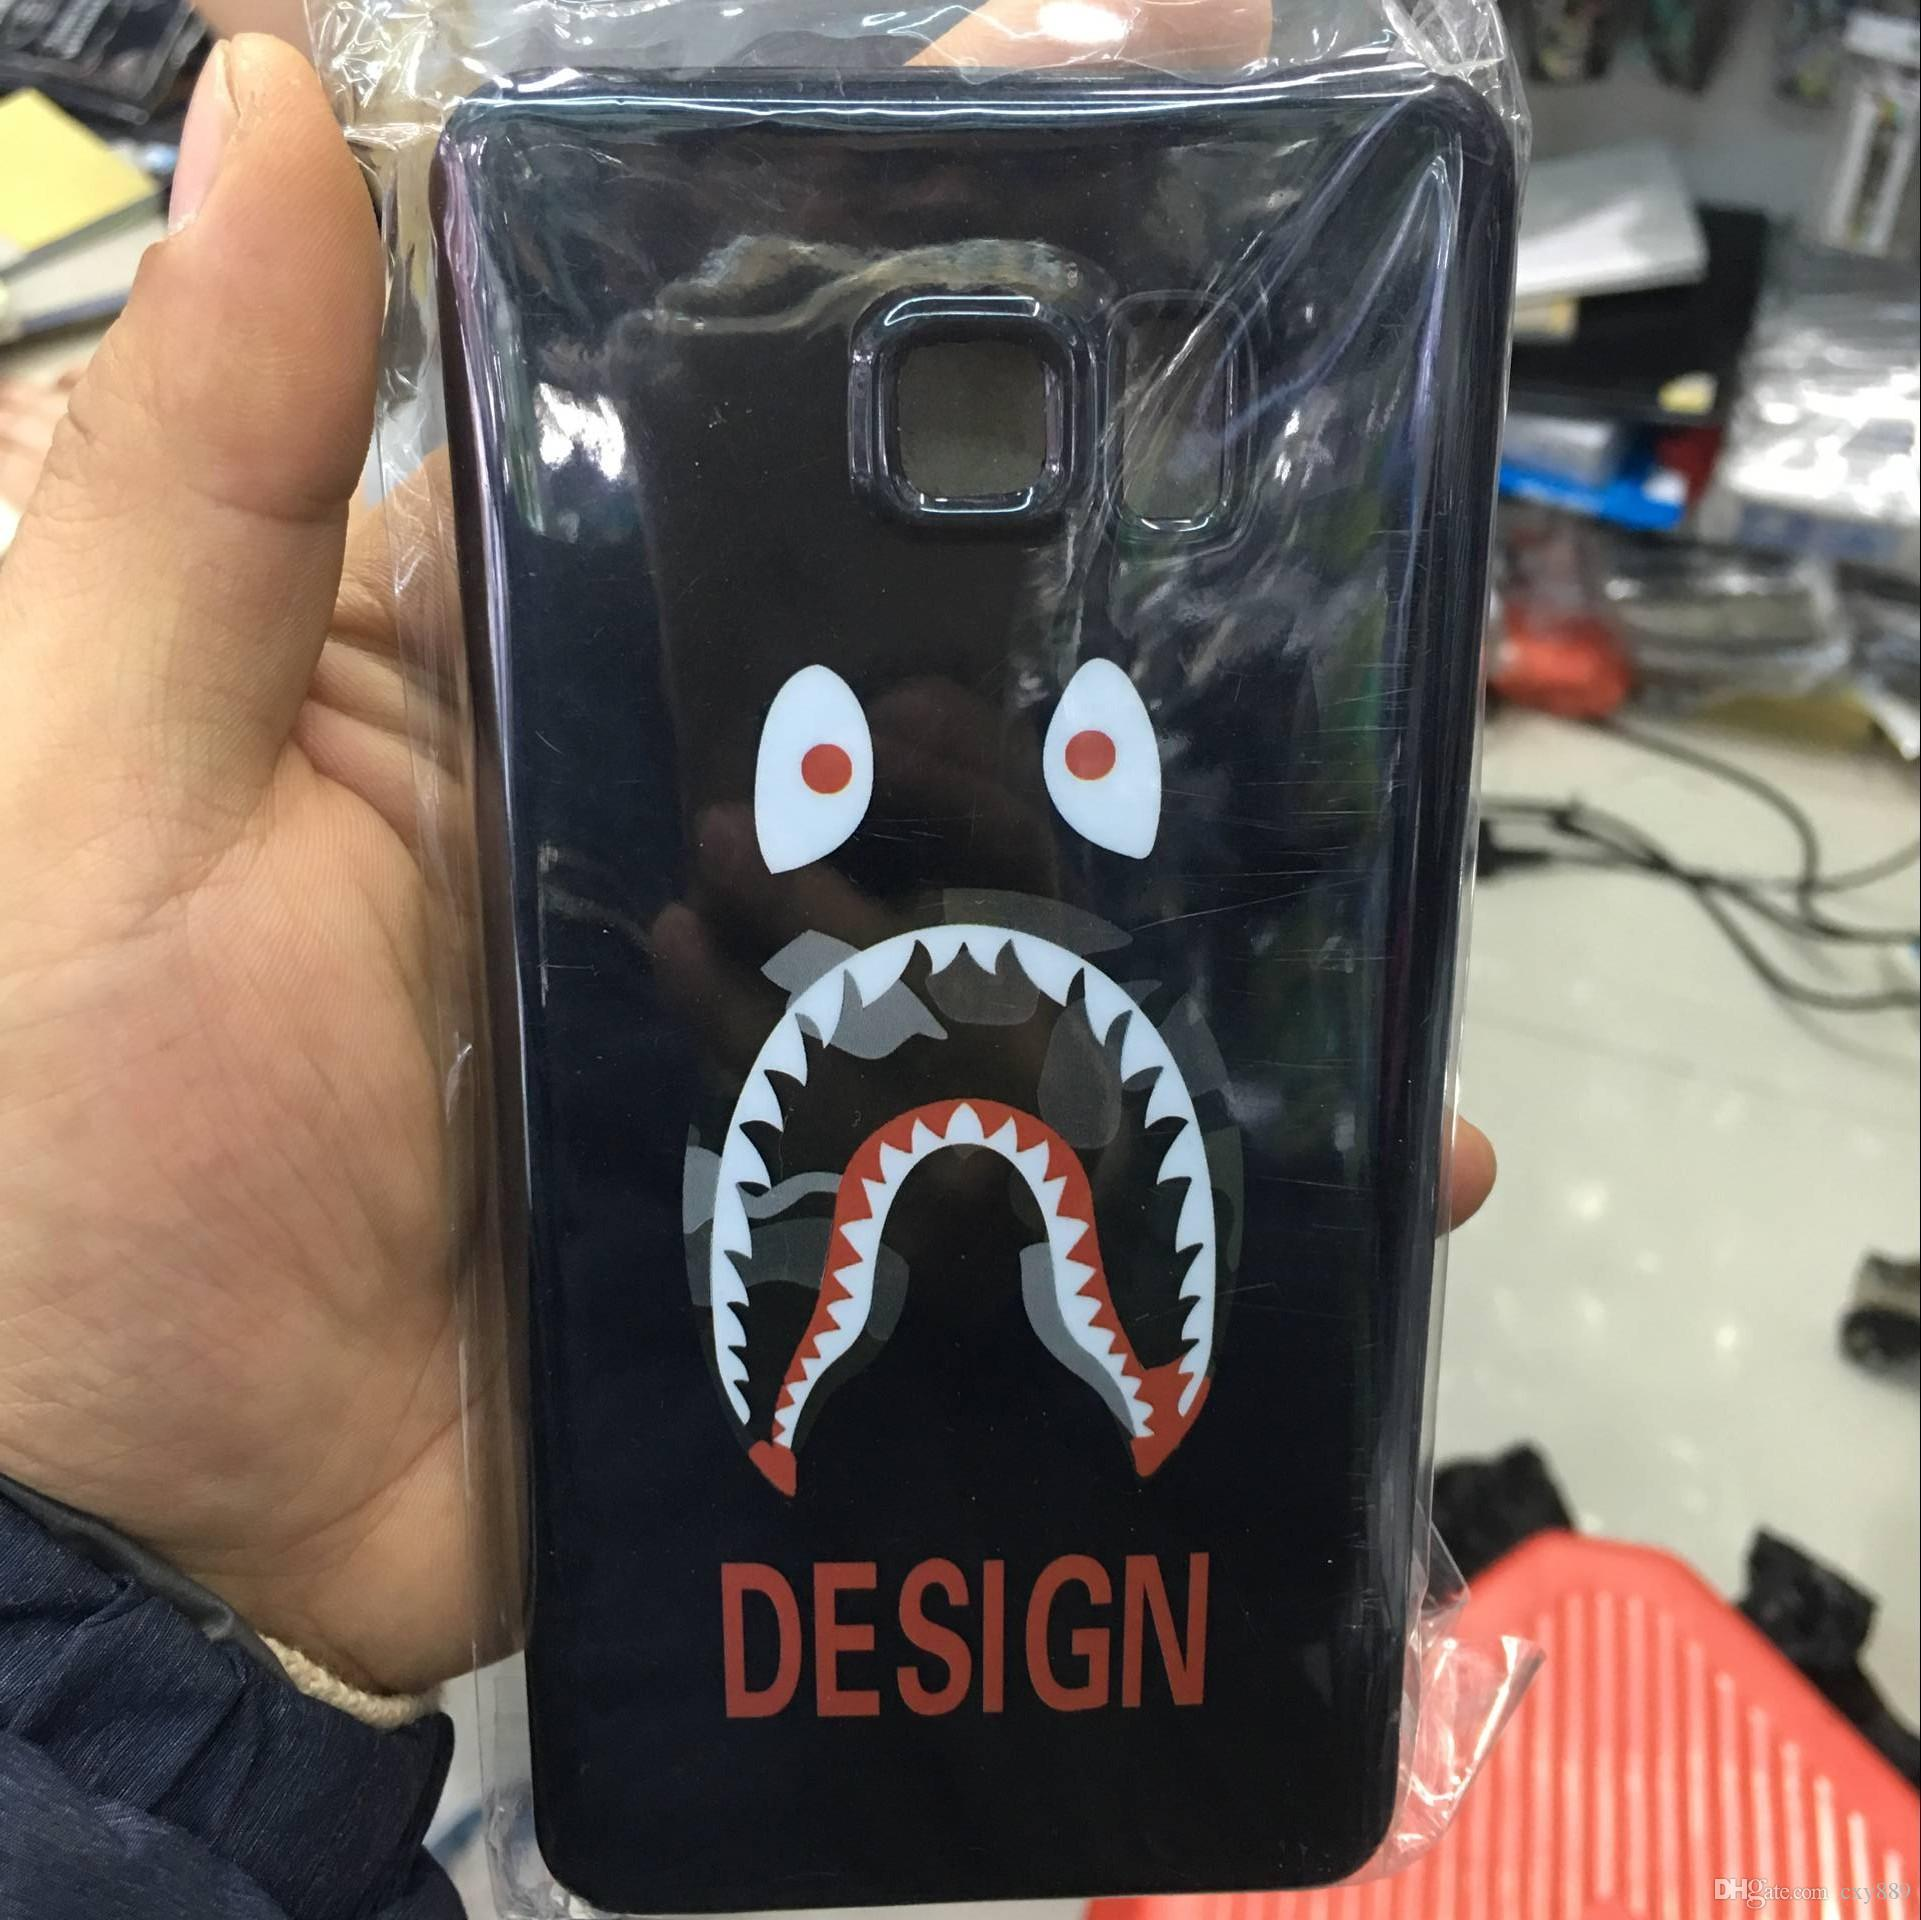 For Sumsung galaxy s6 edge plus A7 A7000 G530 G360 J1 ACE J2 cartoon shark soft TPU case black silicone cases